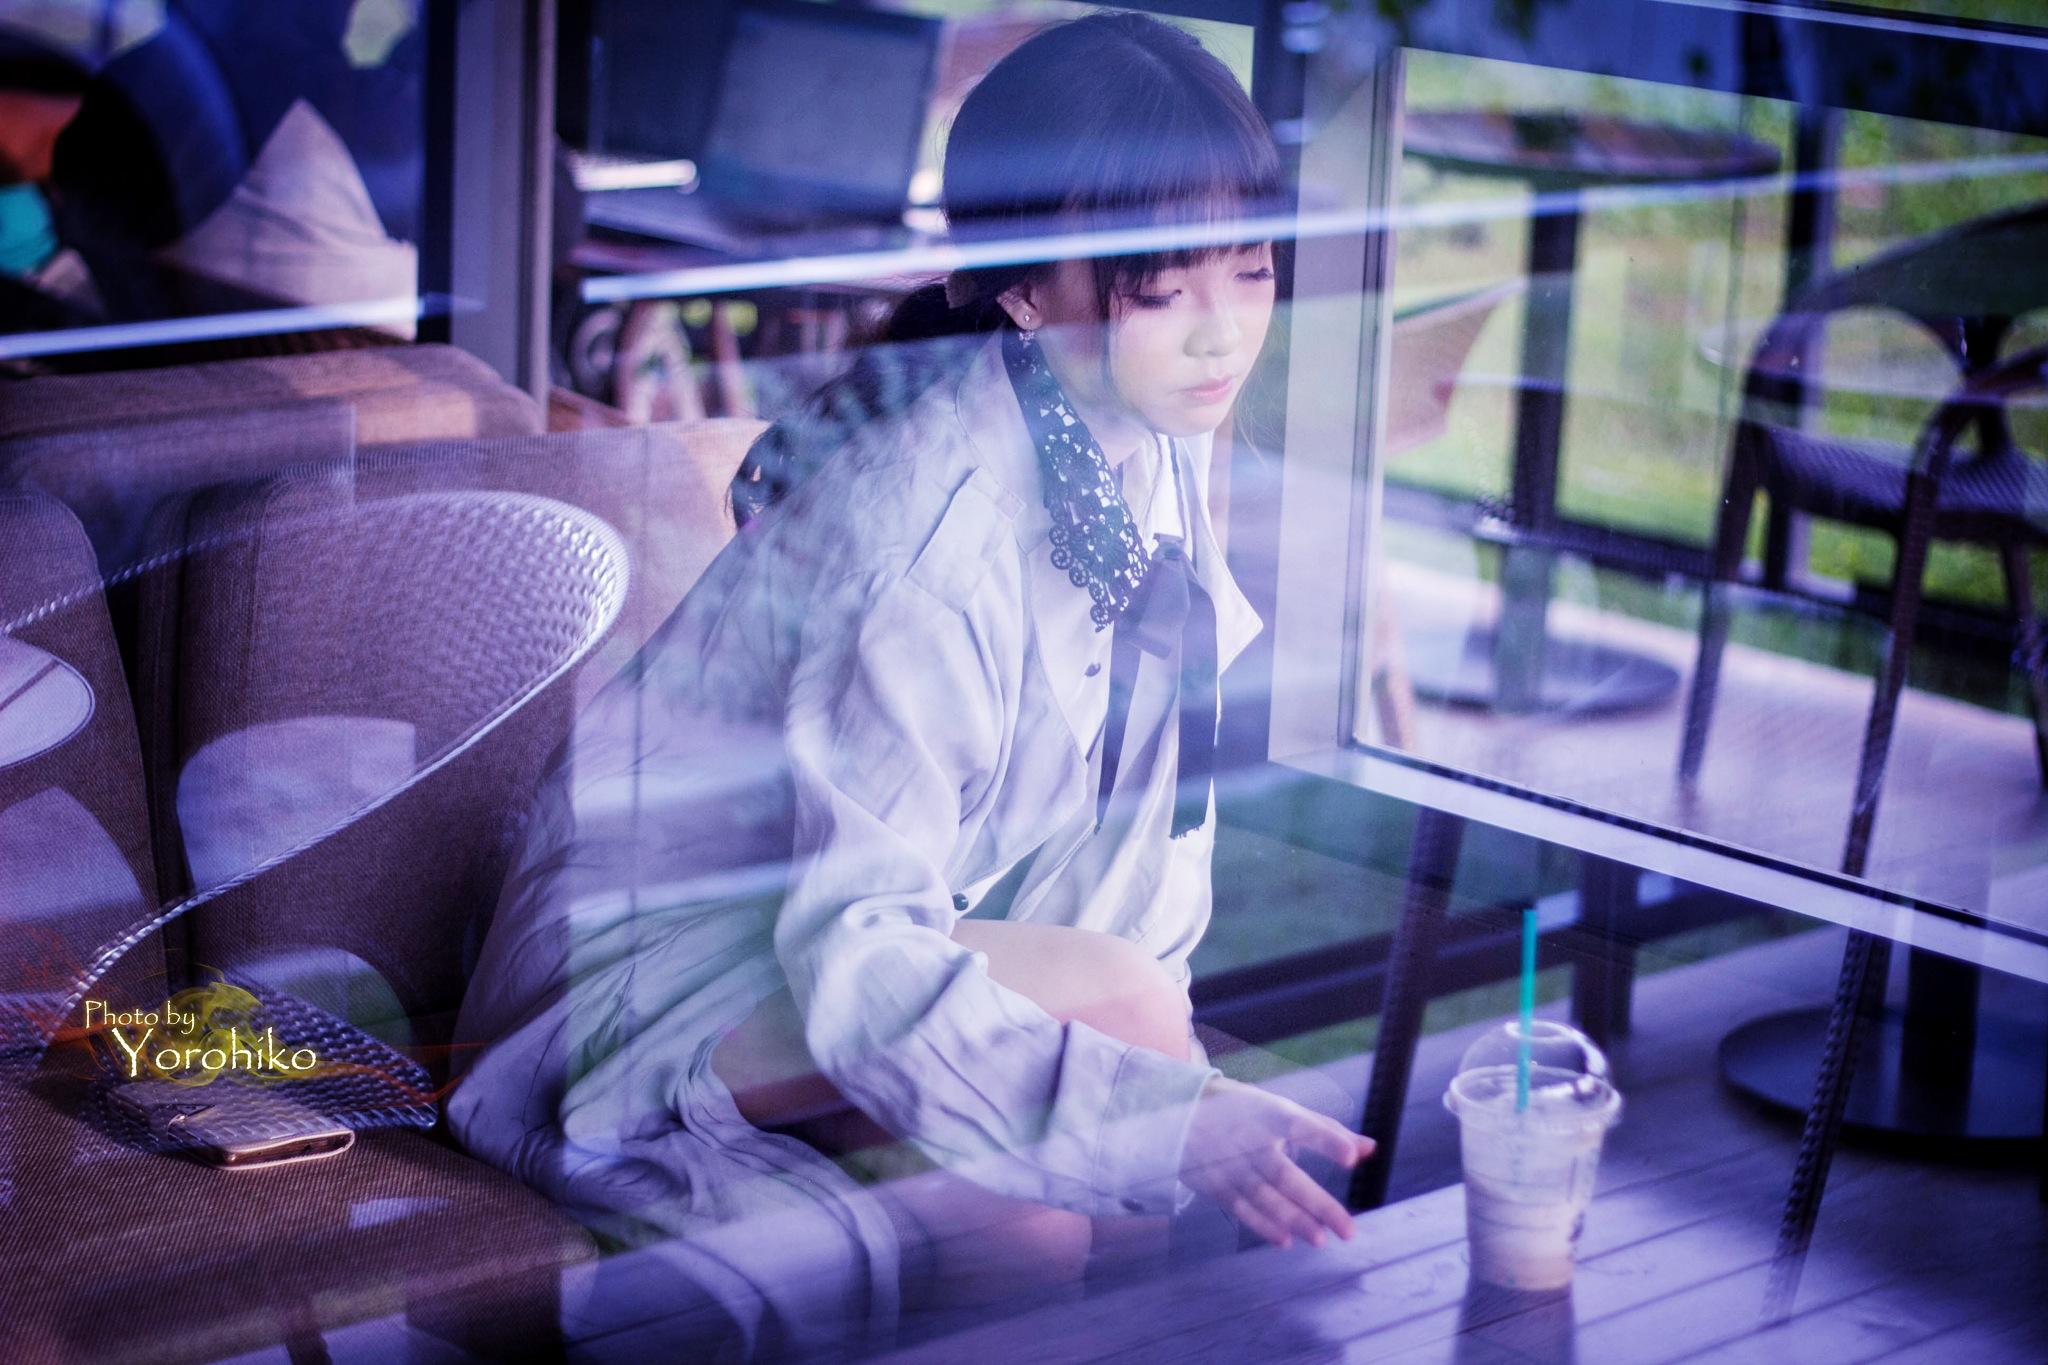 Untitled by yorohiko